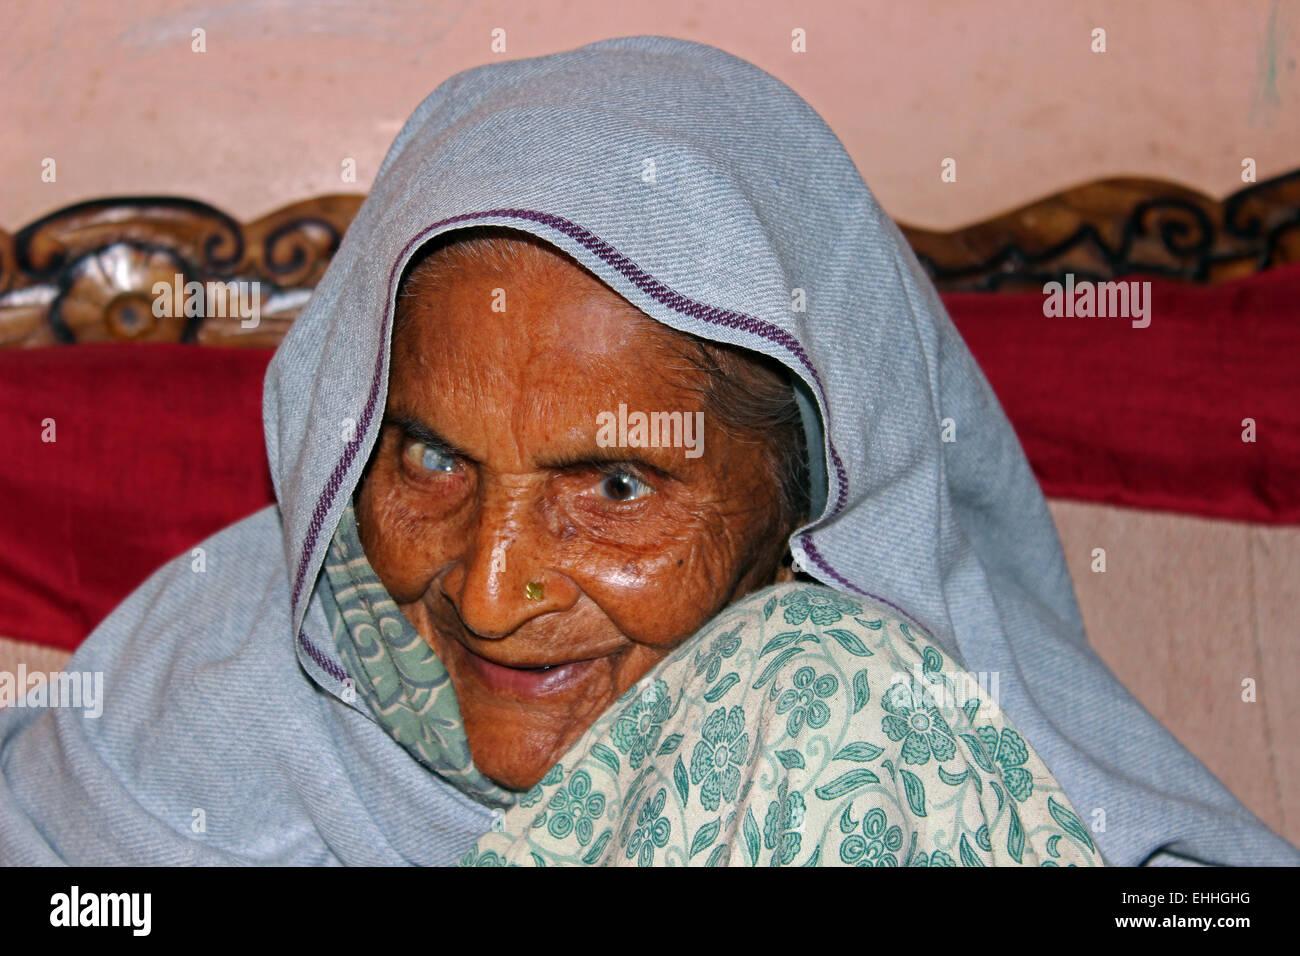 age, alone, concerned, elderly, ladies, lady, lonely, looking, medication, medicine, old, pensioner, pills, ridden, - Stock Image